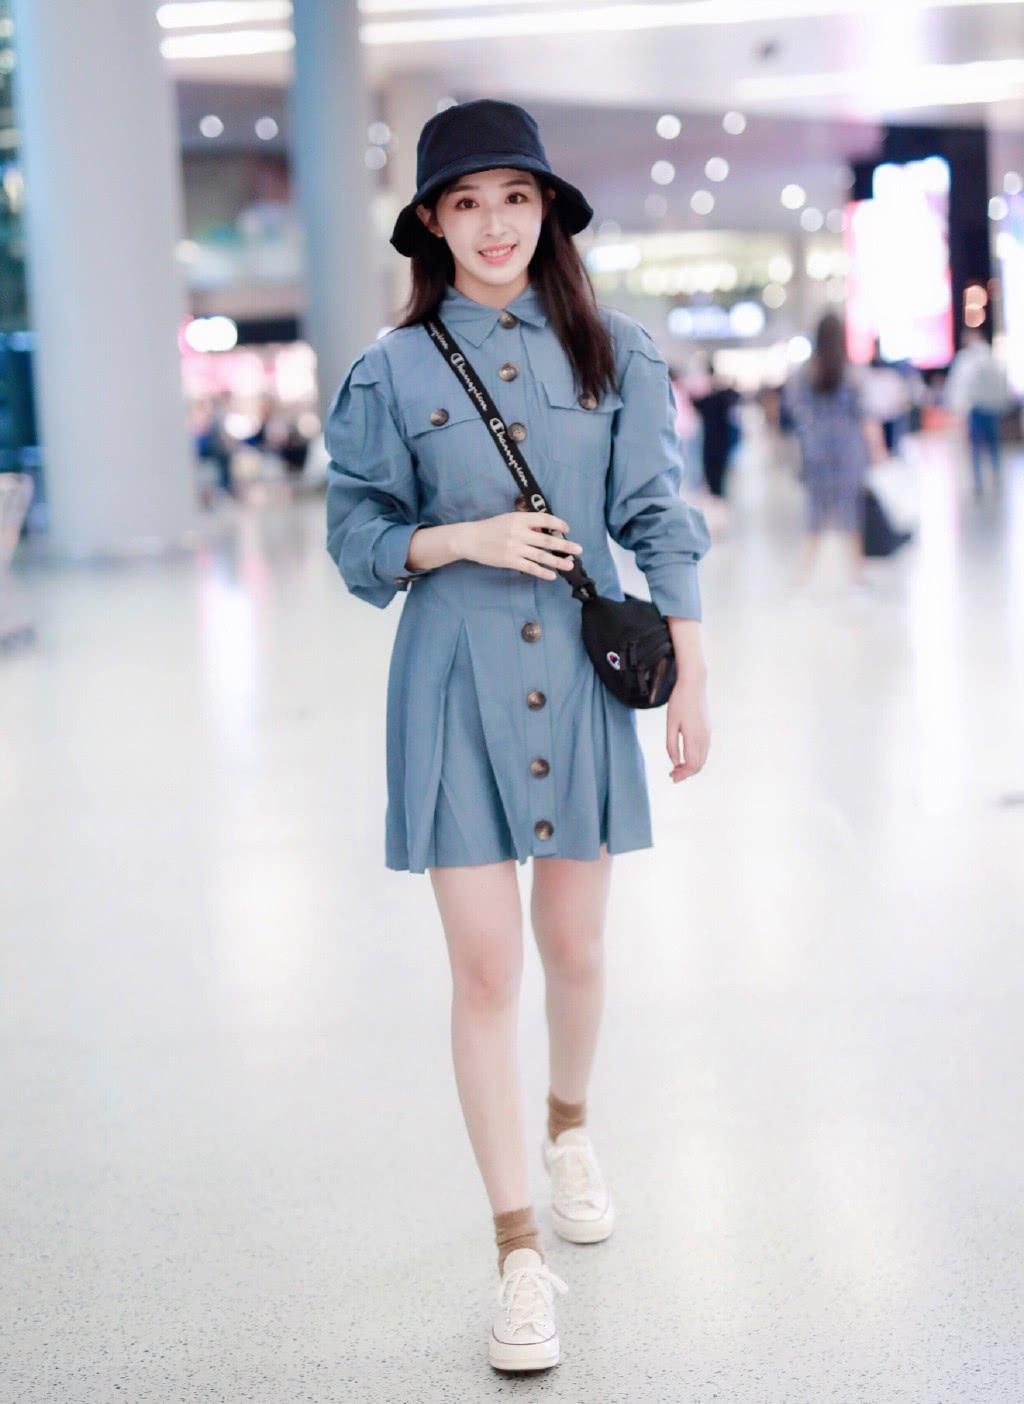 <b>她15岁因《超级女声》红遍中国,穿衬衫裙戴渔夫帽,少女感十足</b>